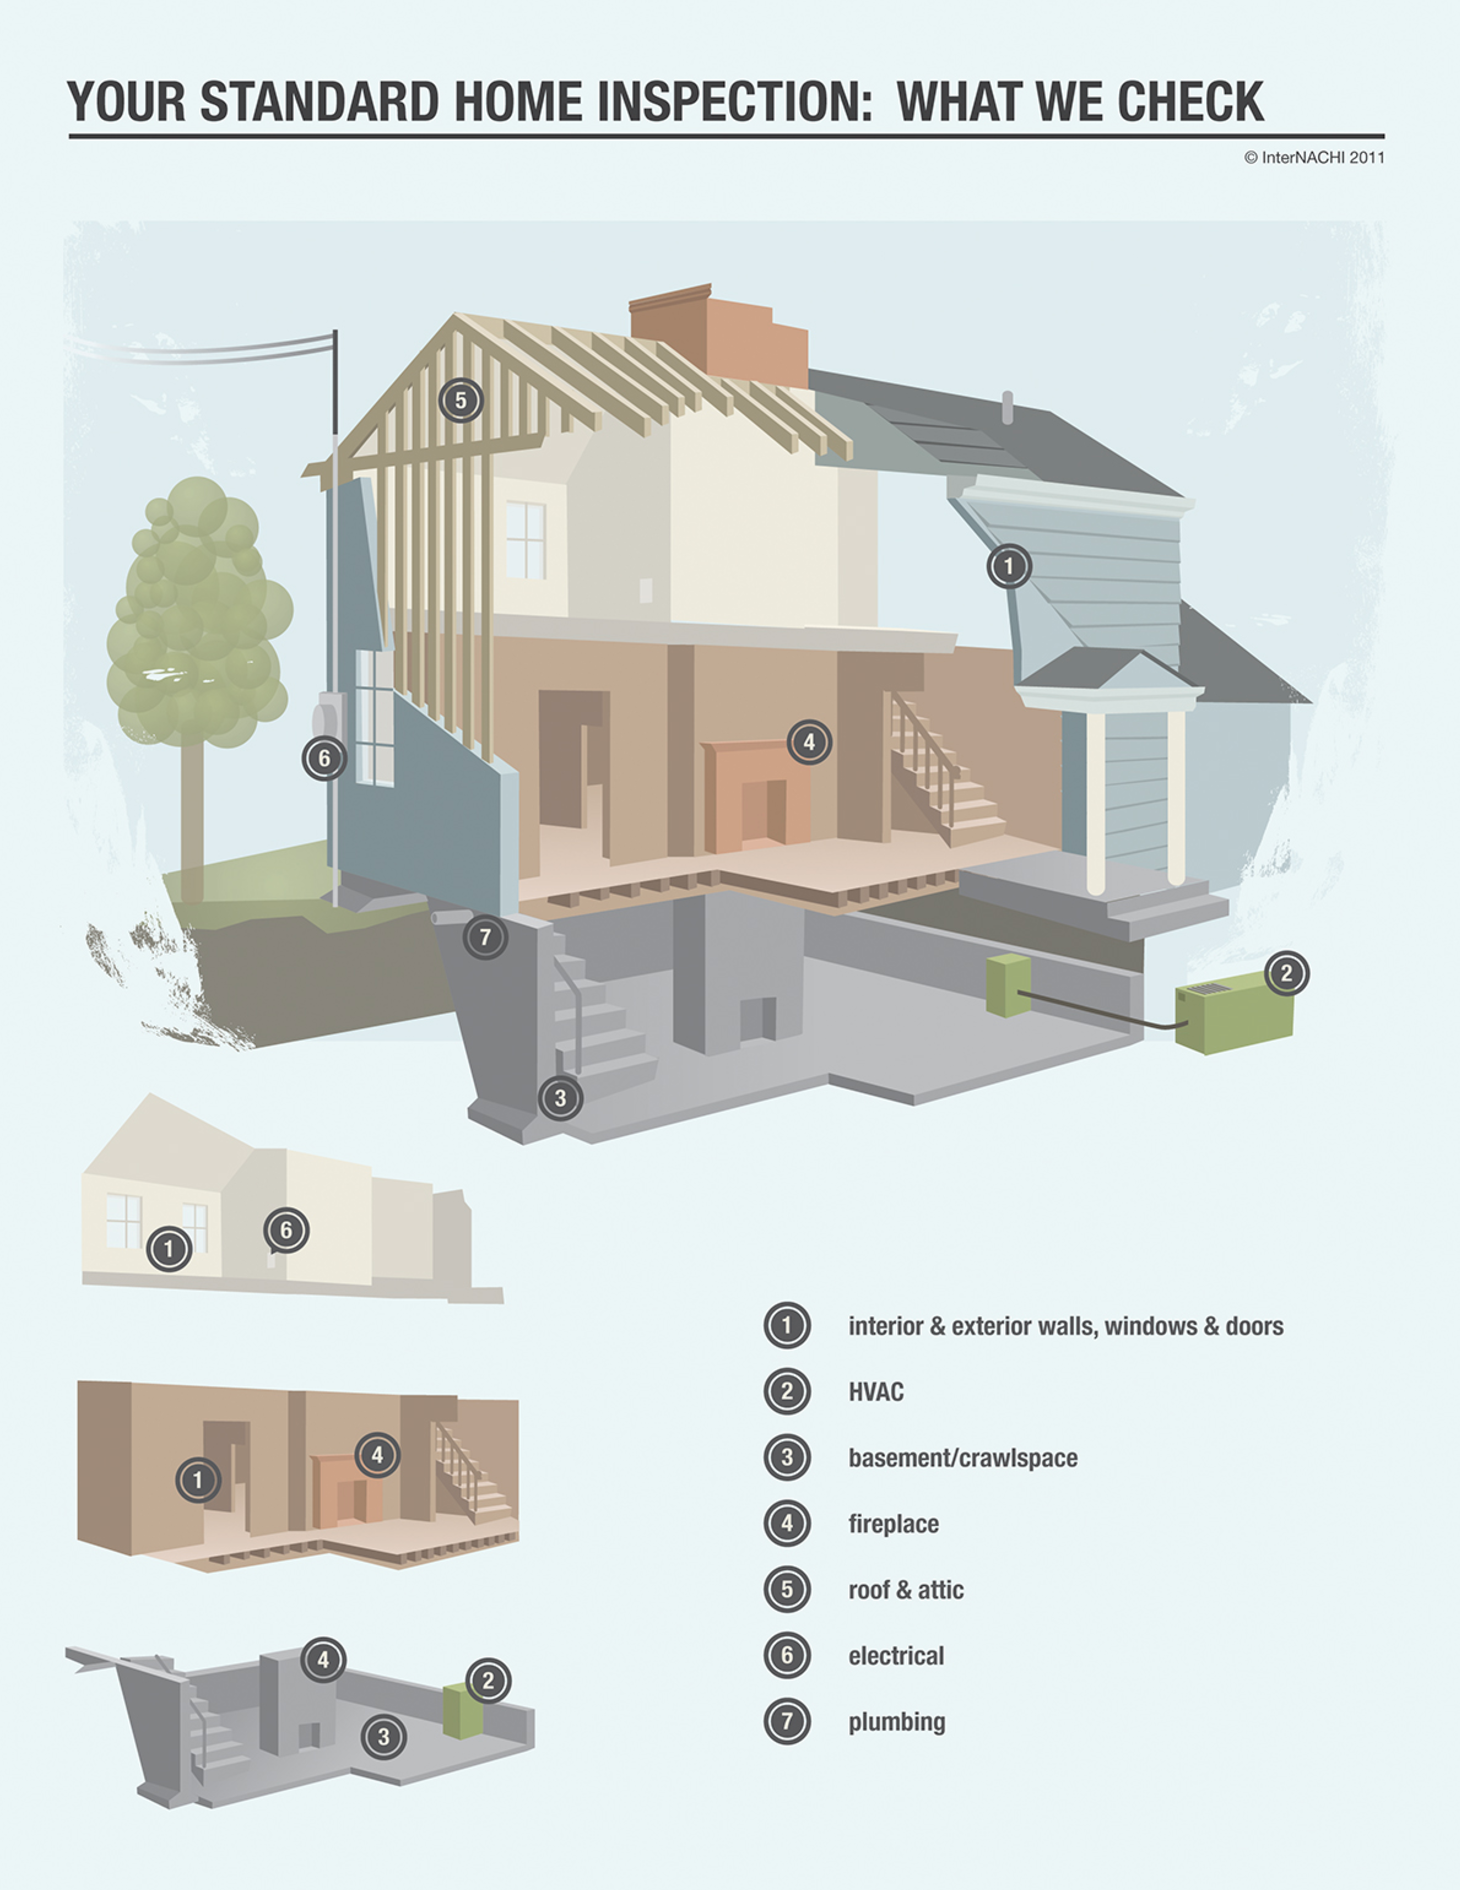 Standard_Home_Inspection_Nachi